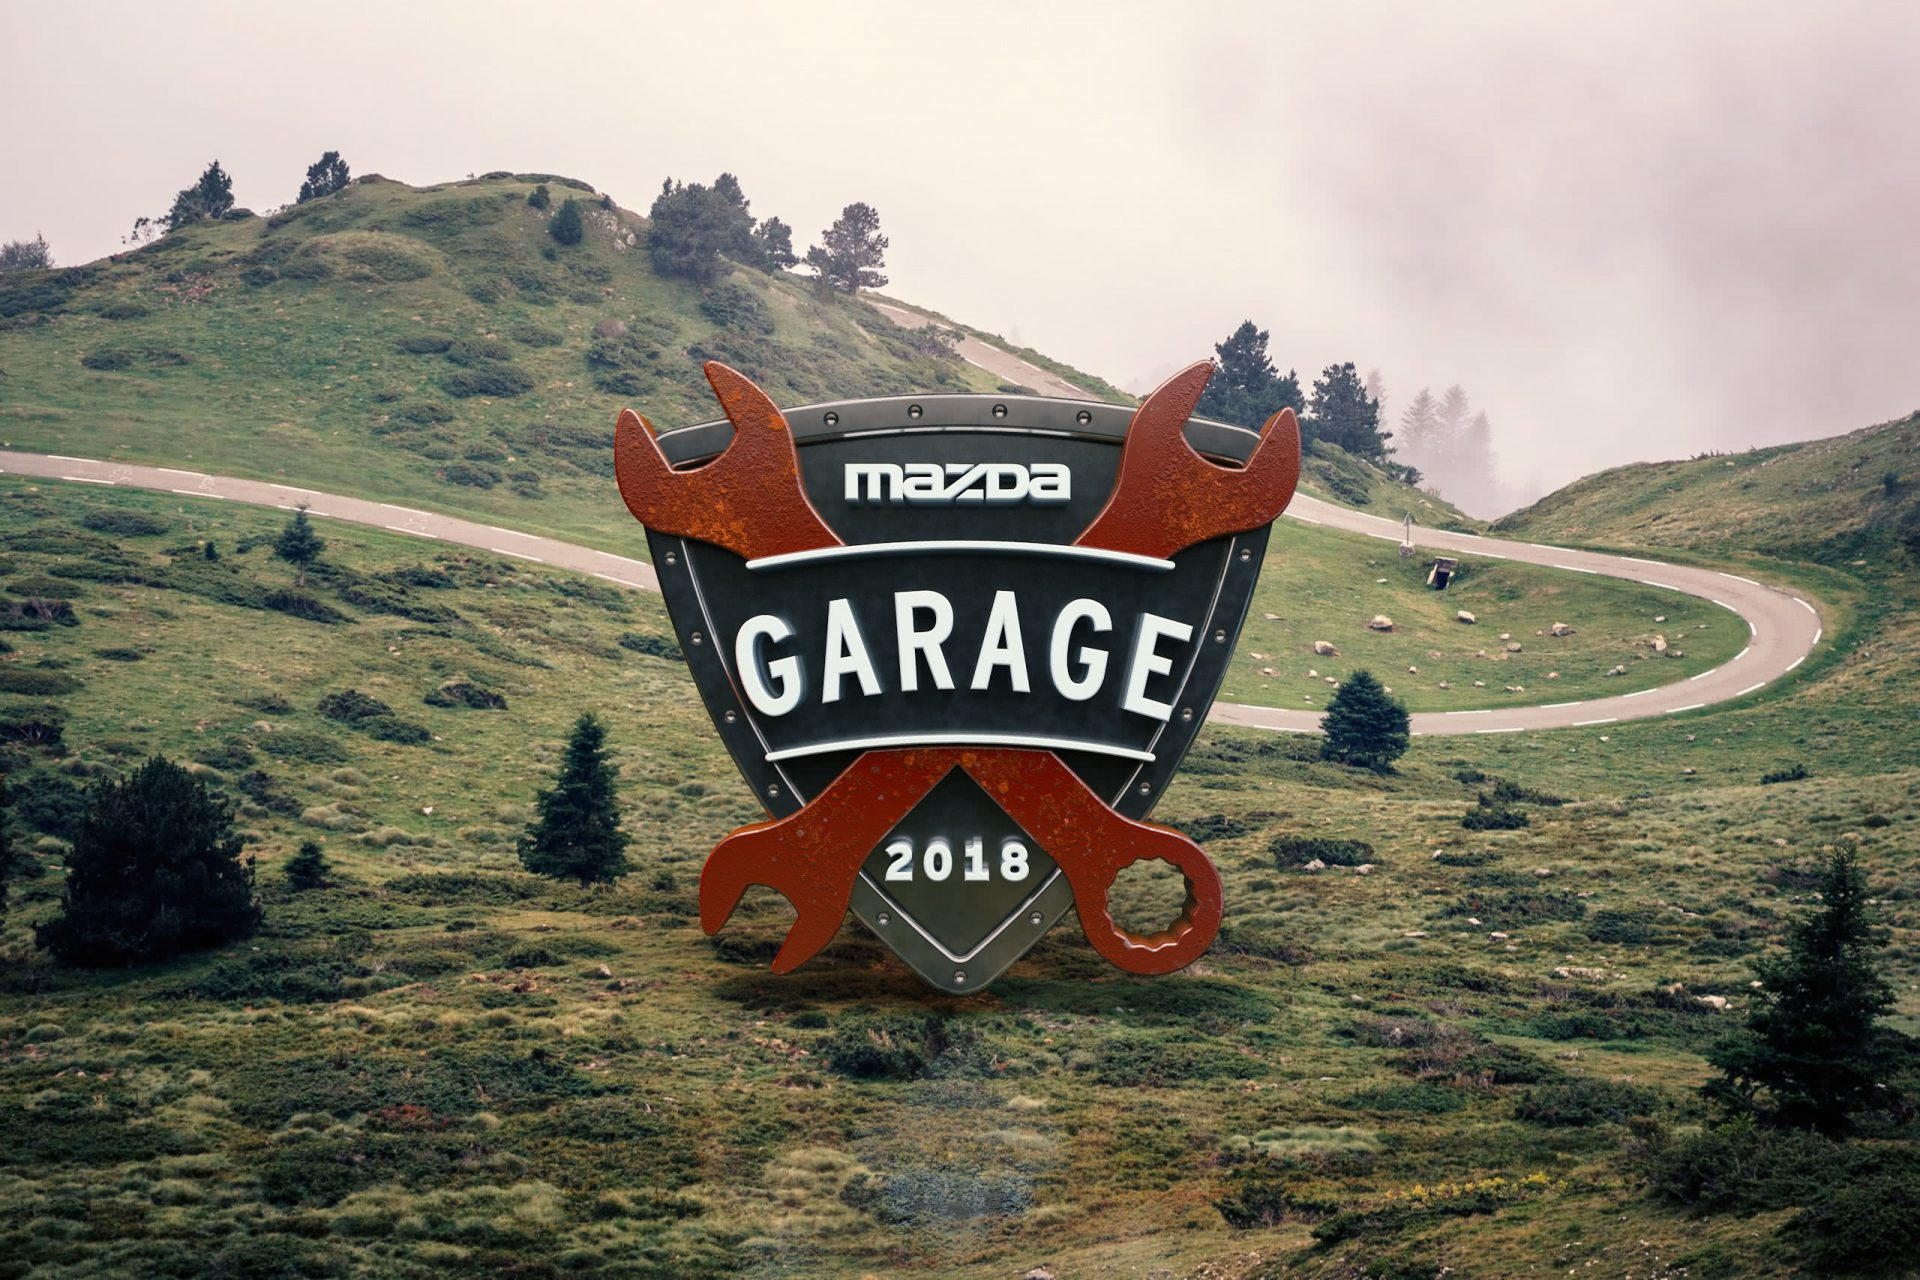 Mazda Garage 2